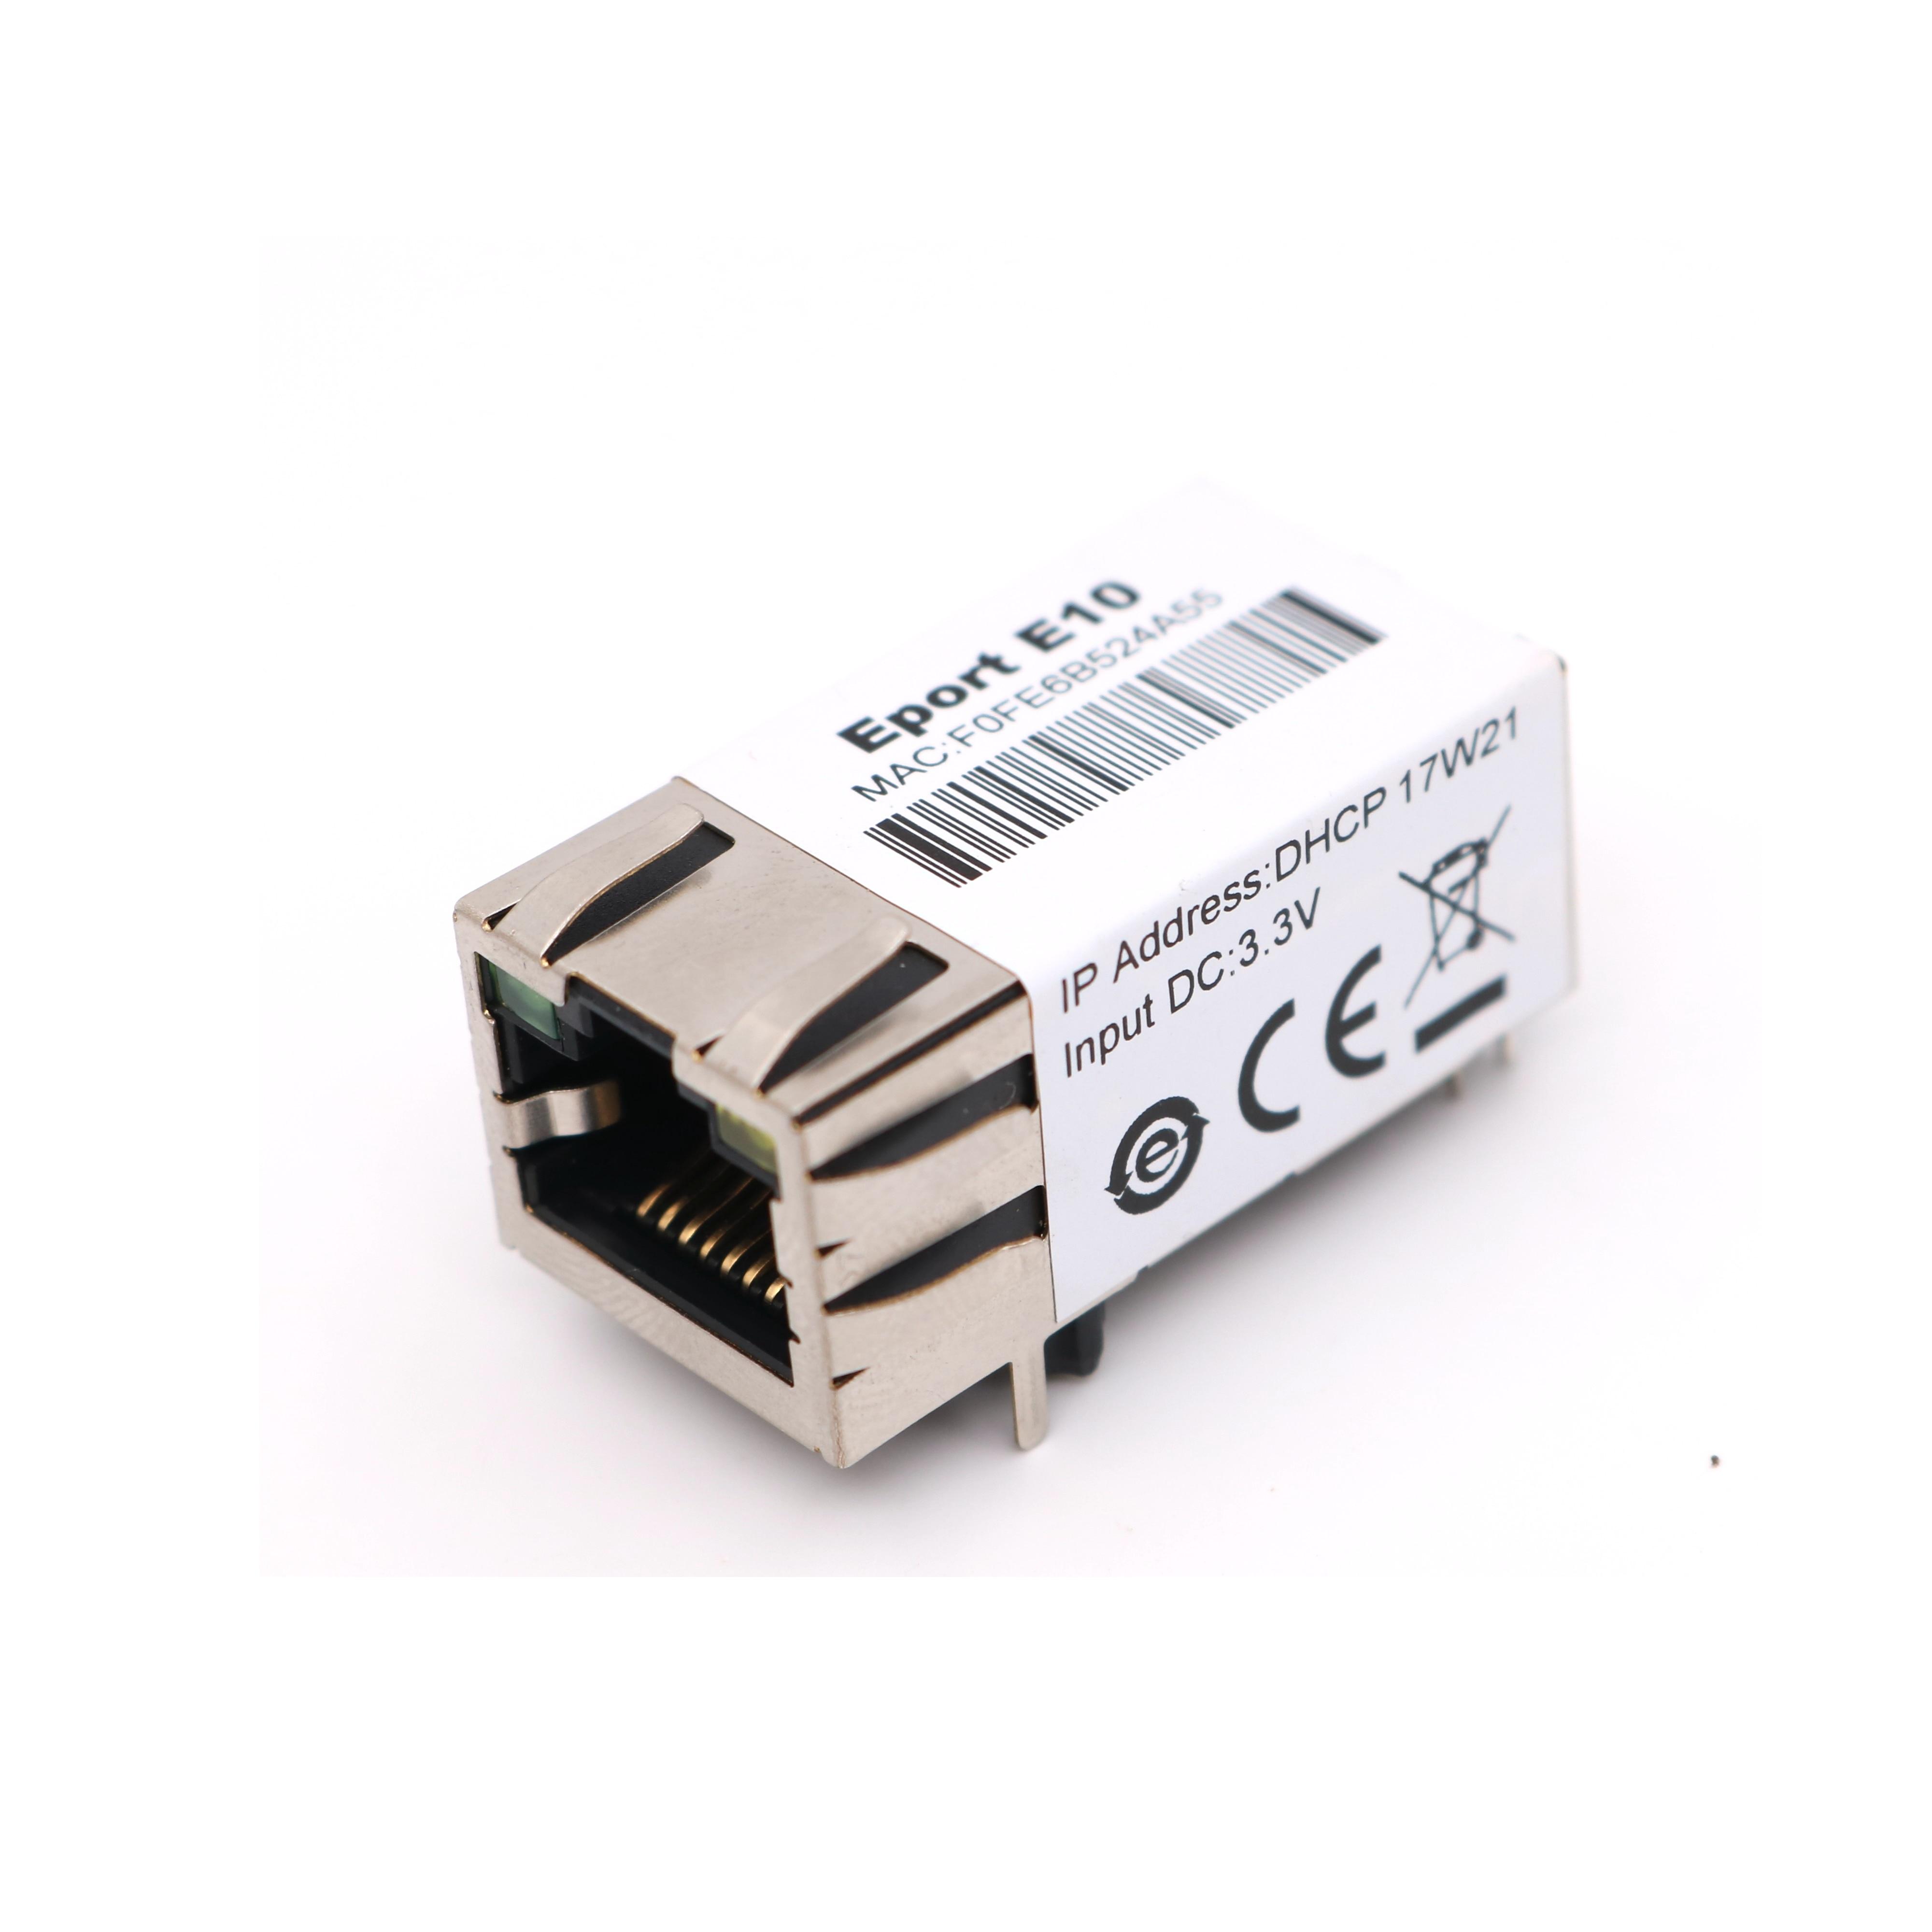 serial port TTL go to Ethernet module 10/100 TCP/IP RJ45